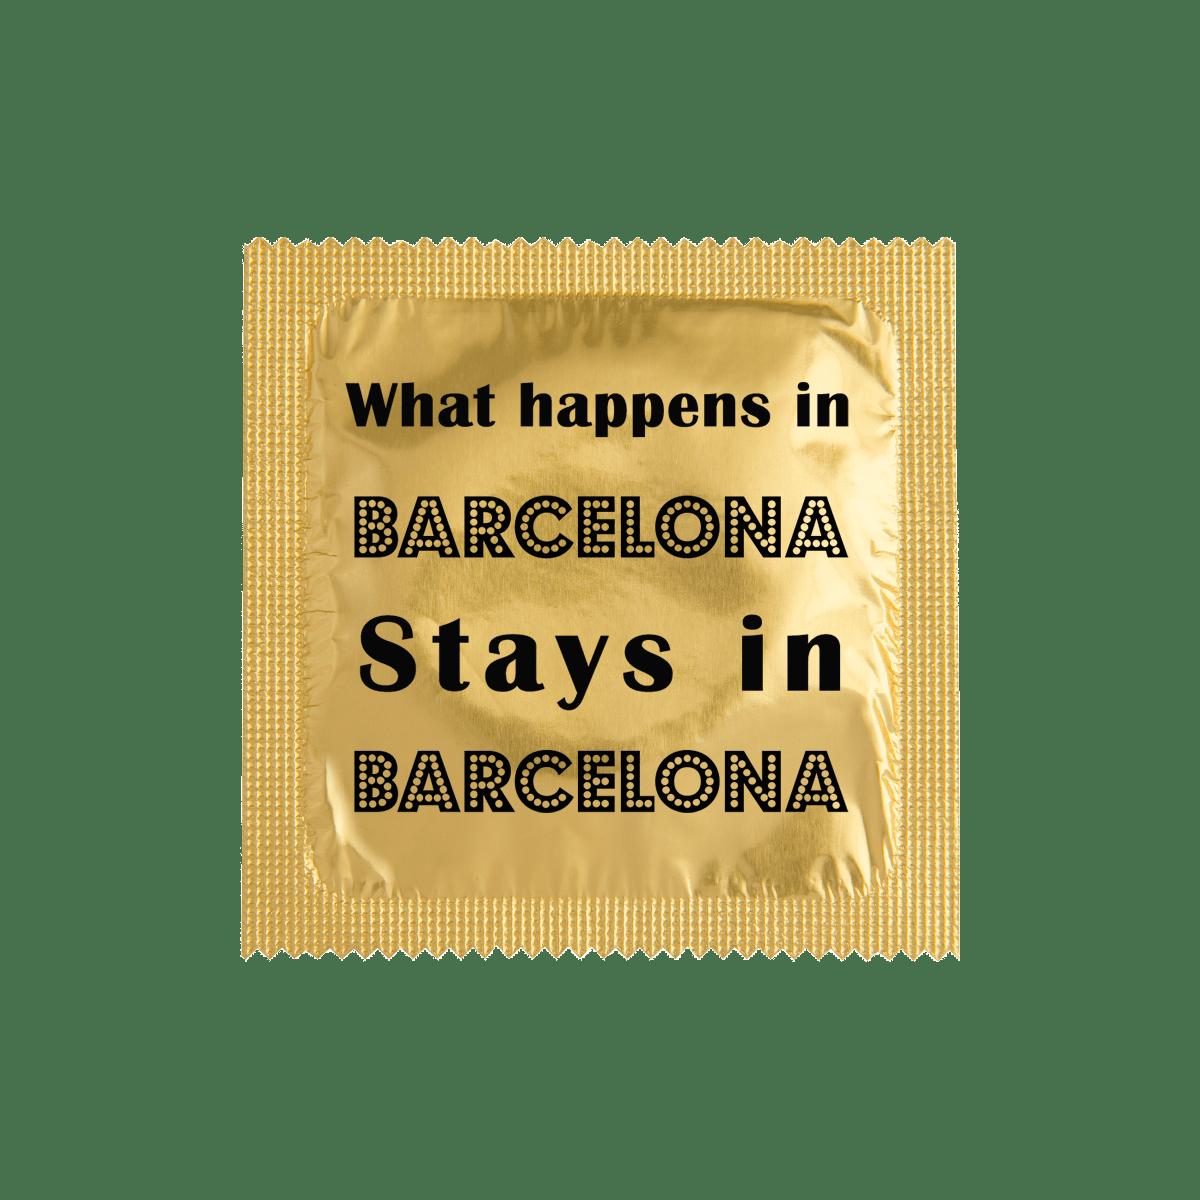 Barcelona dating scene mu completa musulmana